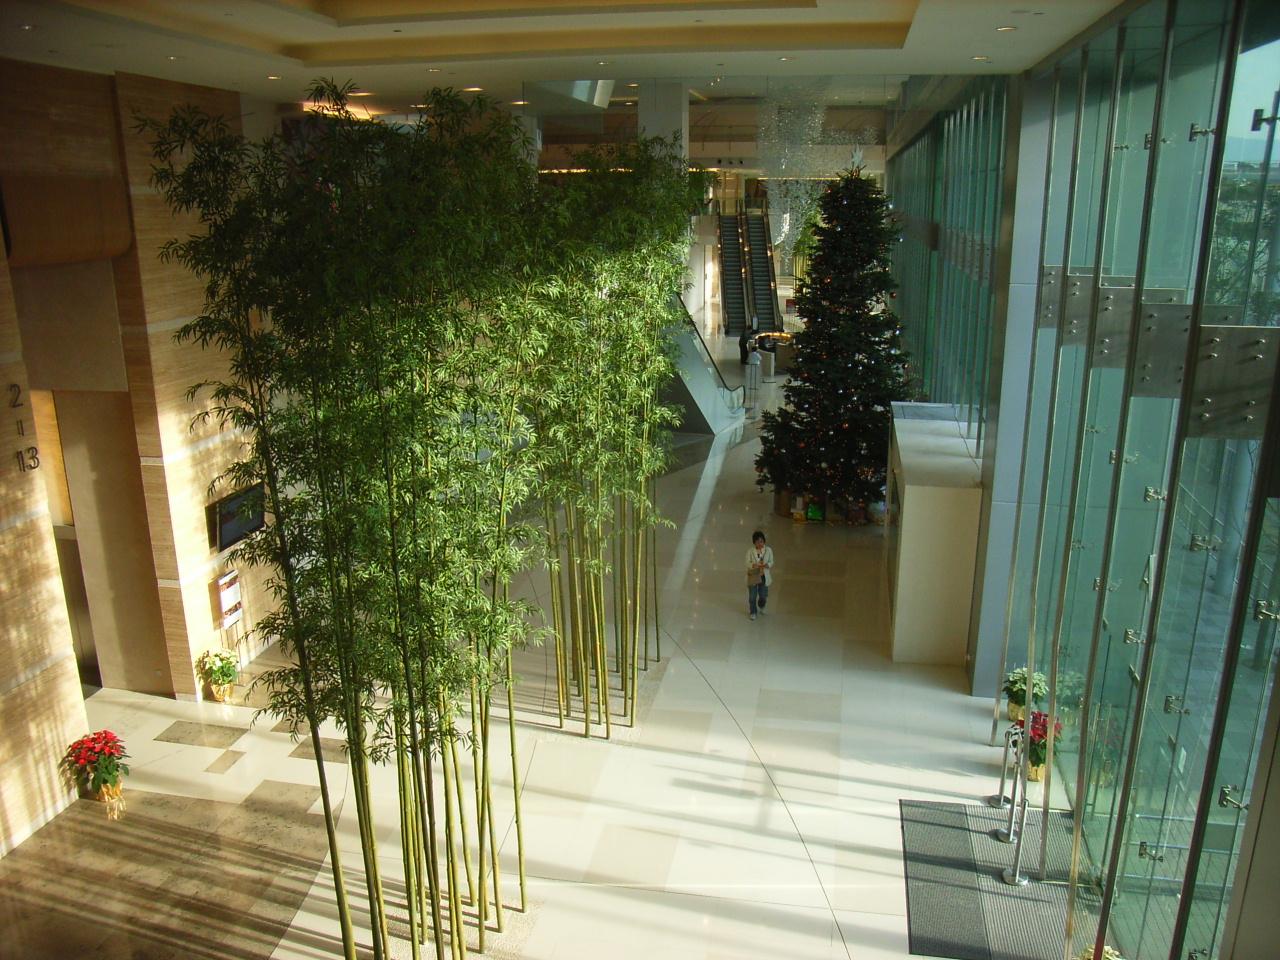 File:HK Kwun Tong 223 Lobby hall 01 indoor trees.JPG ...